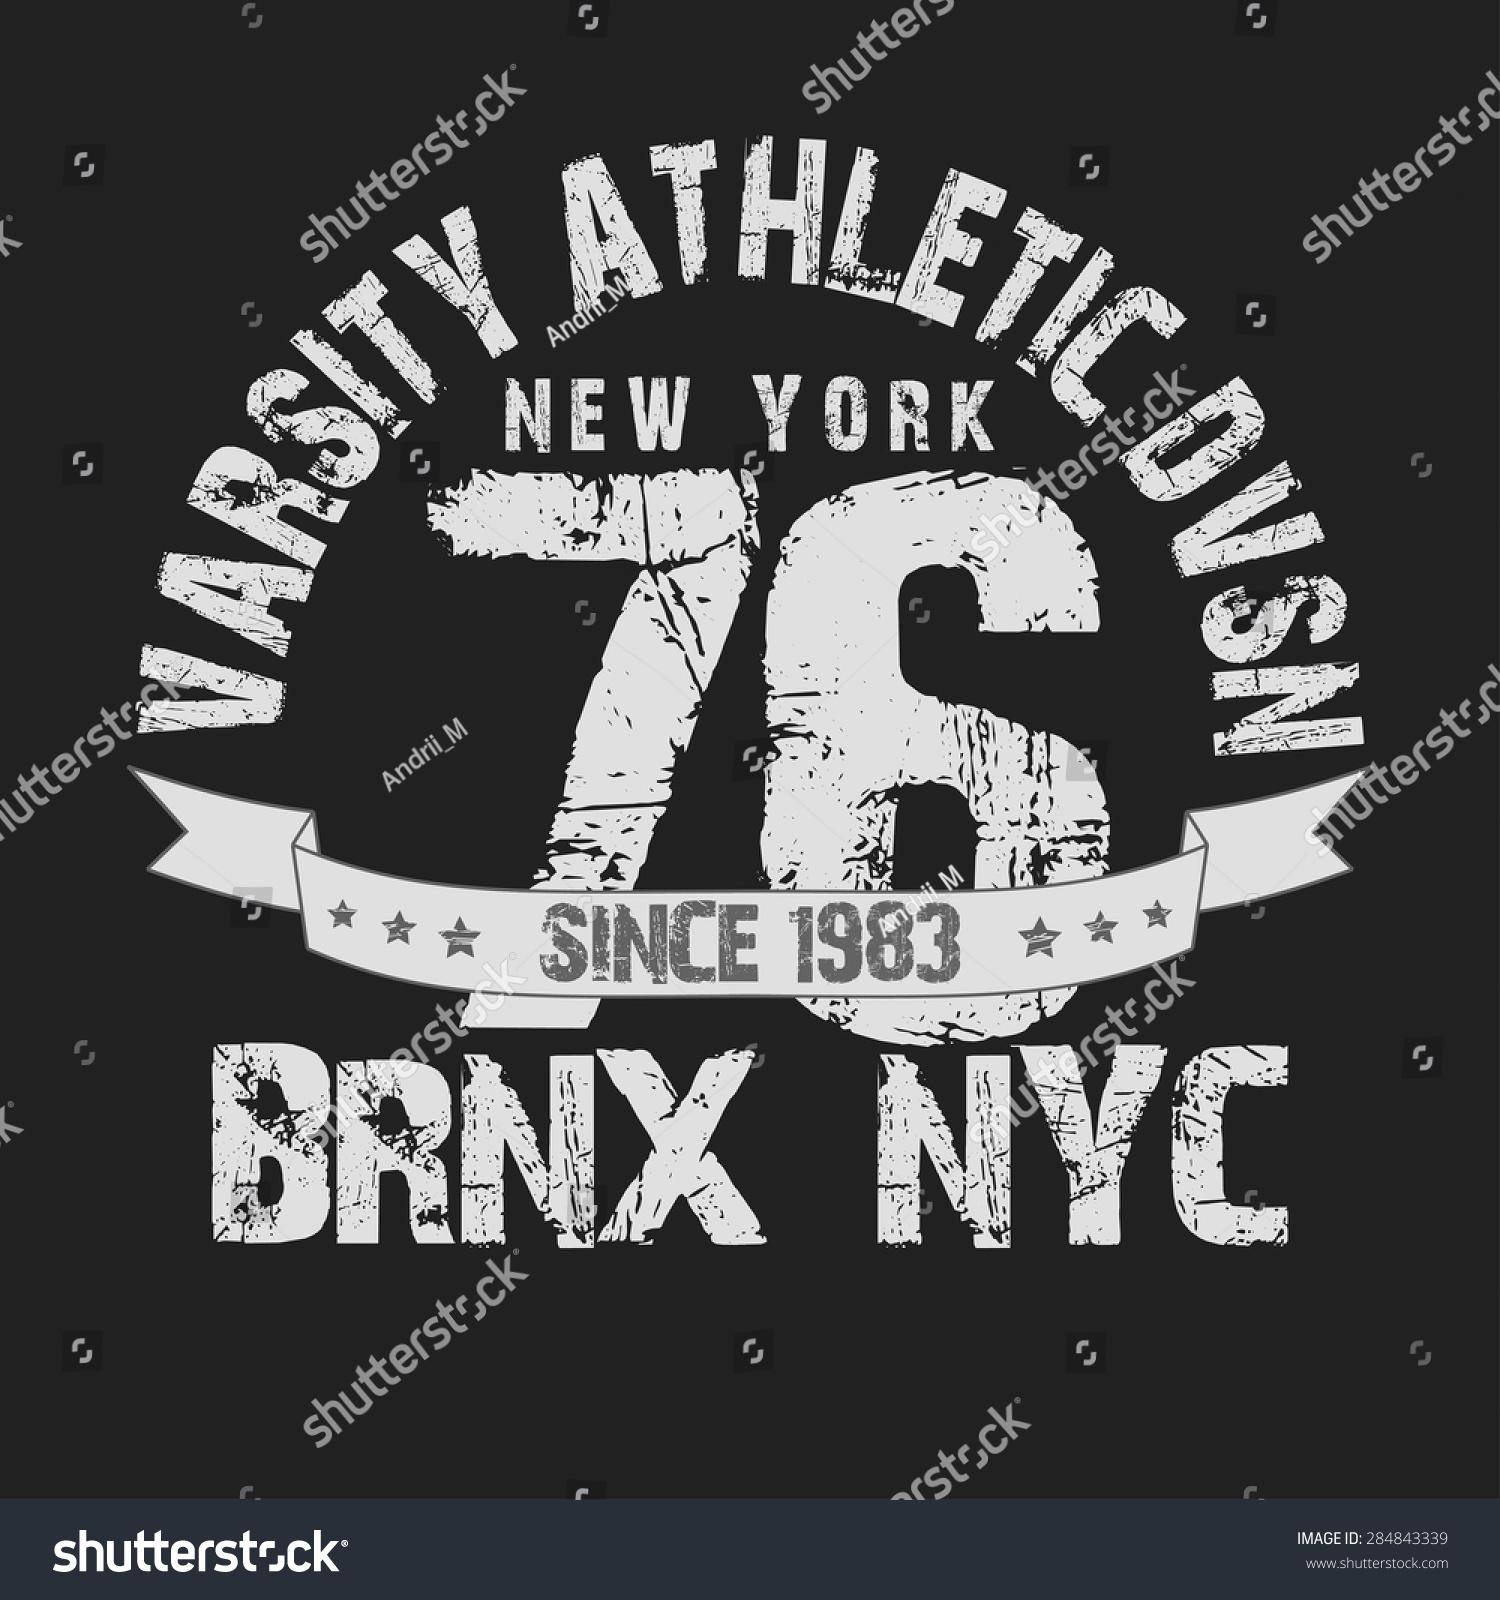 Shirt design nyc - New York City Typography Graphics T Shirt Printing Design Nyc Original Wear